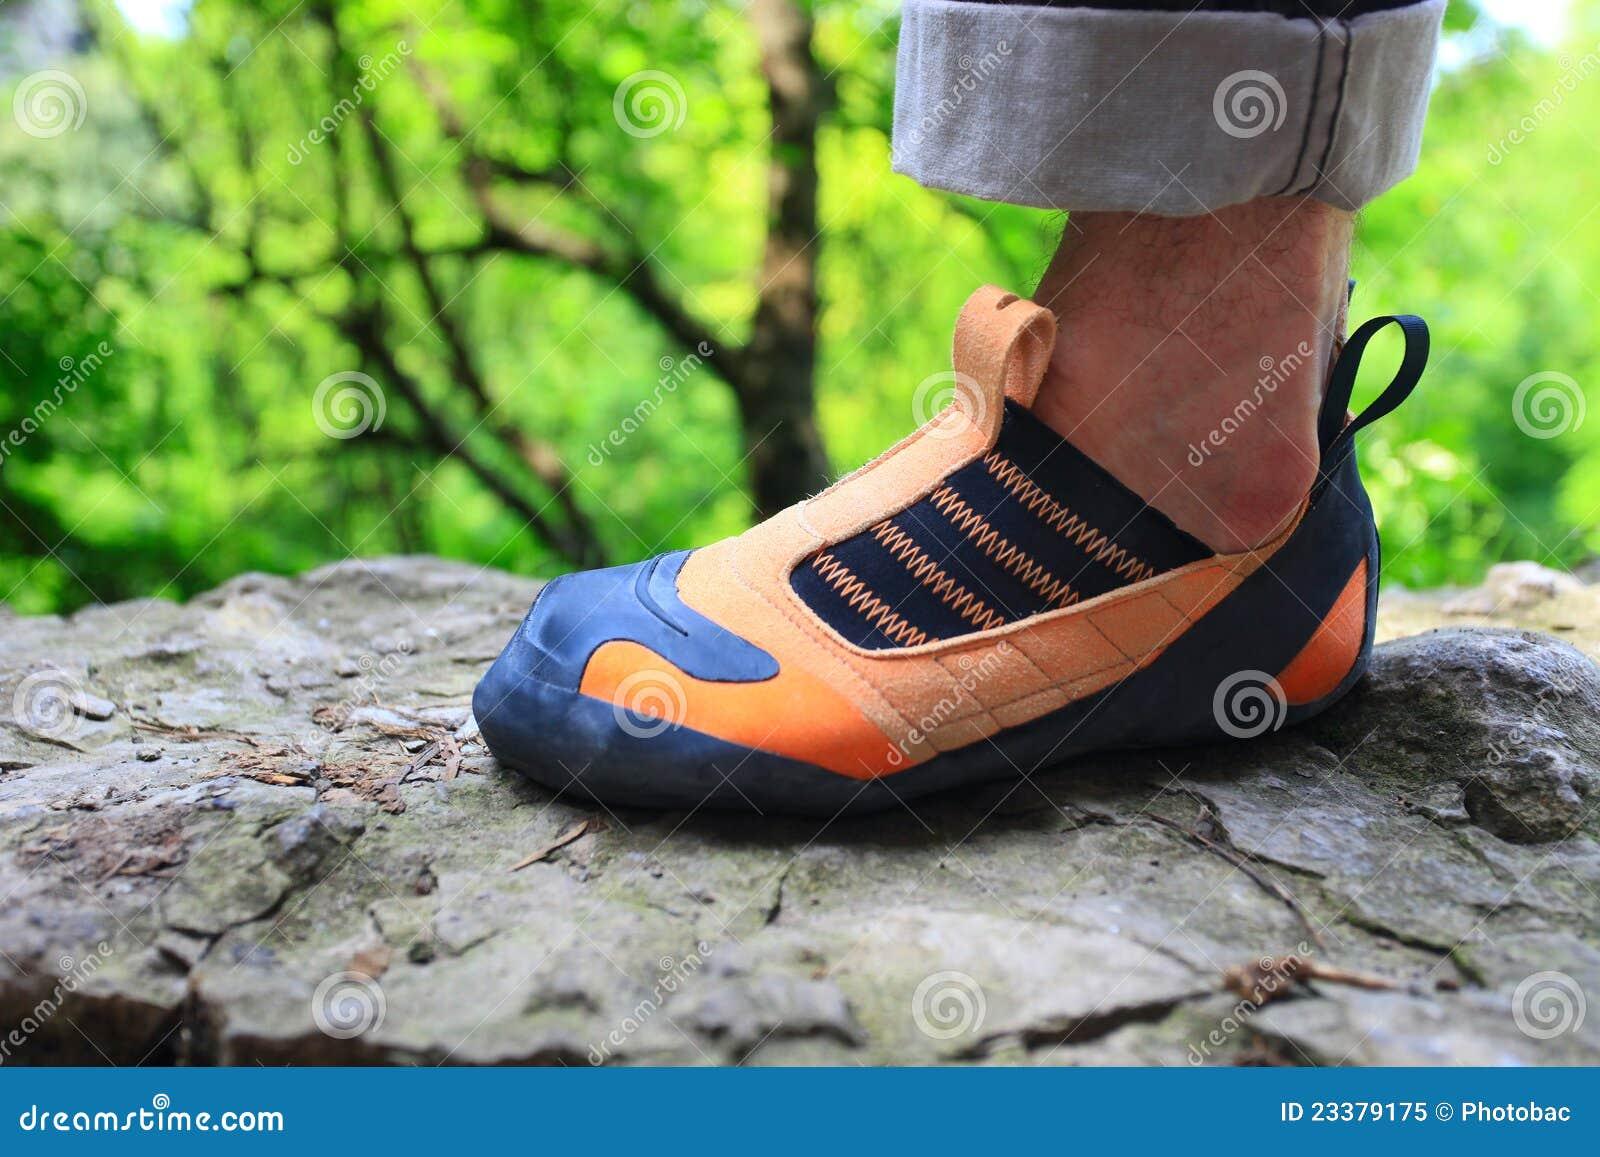 174f61c15e1 ορειβάτης που αναρριχείται στο παπούτσι βράχου S ποδιών Στοκ Εικόνα ...